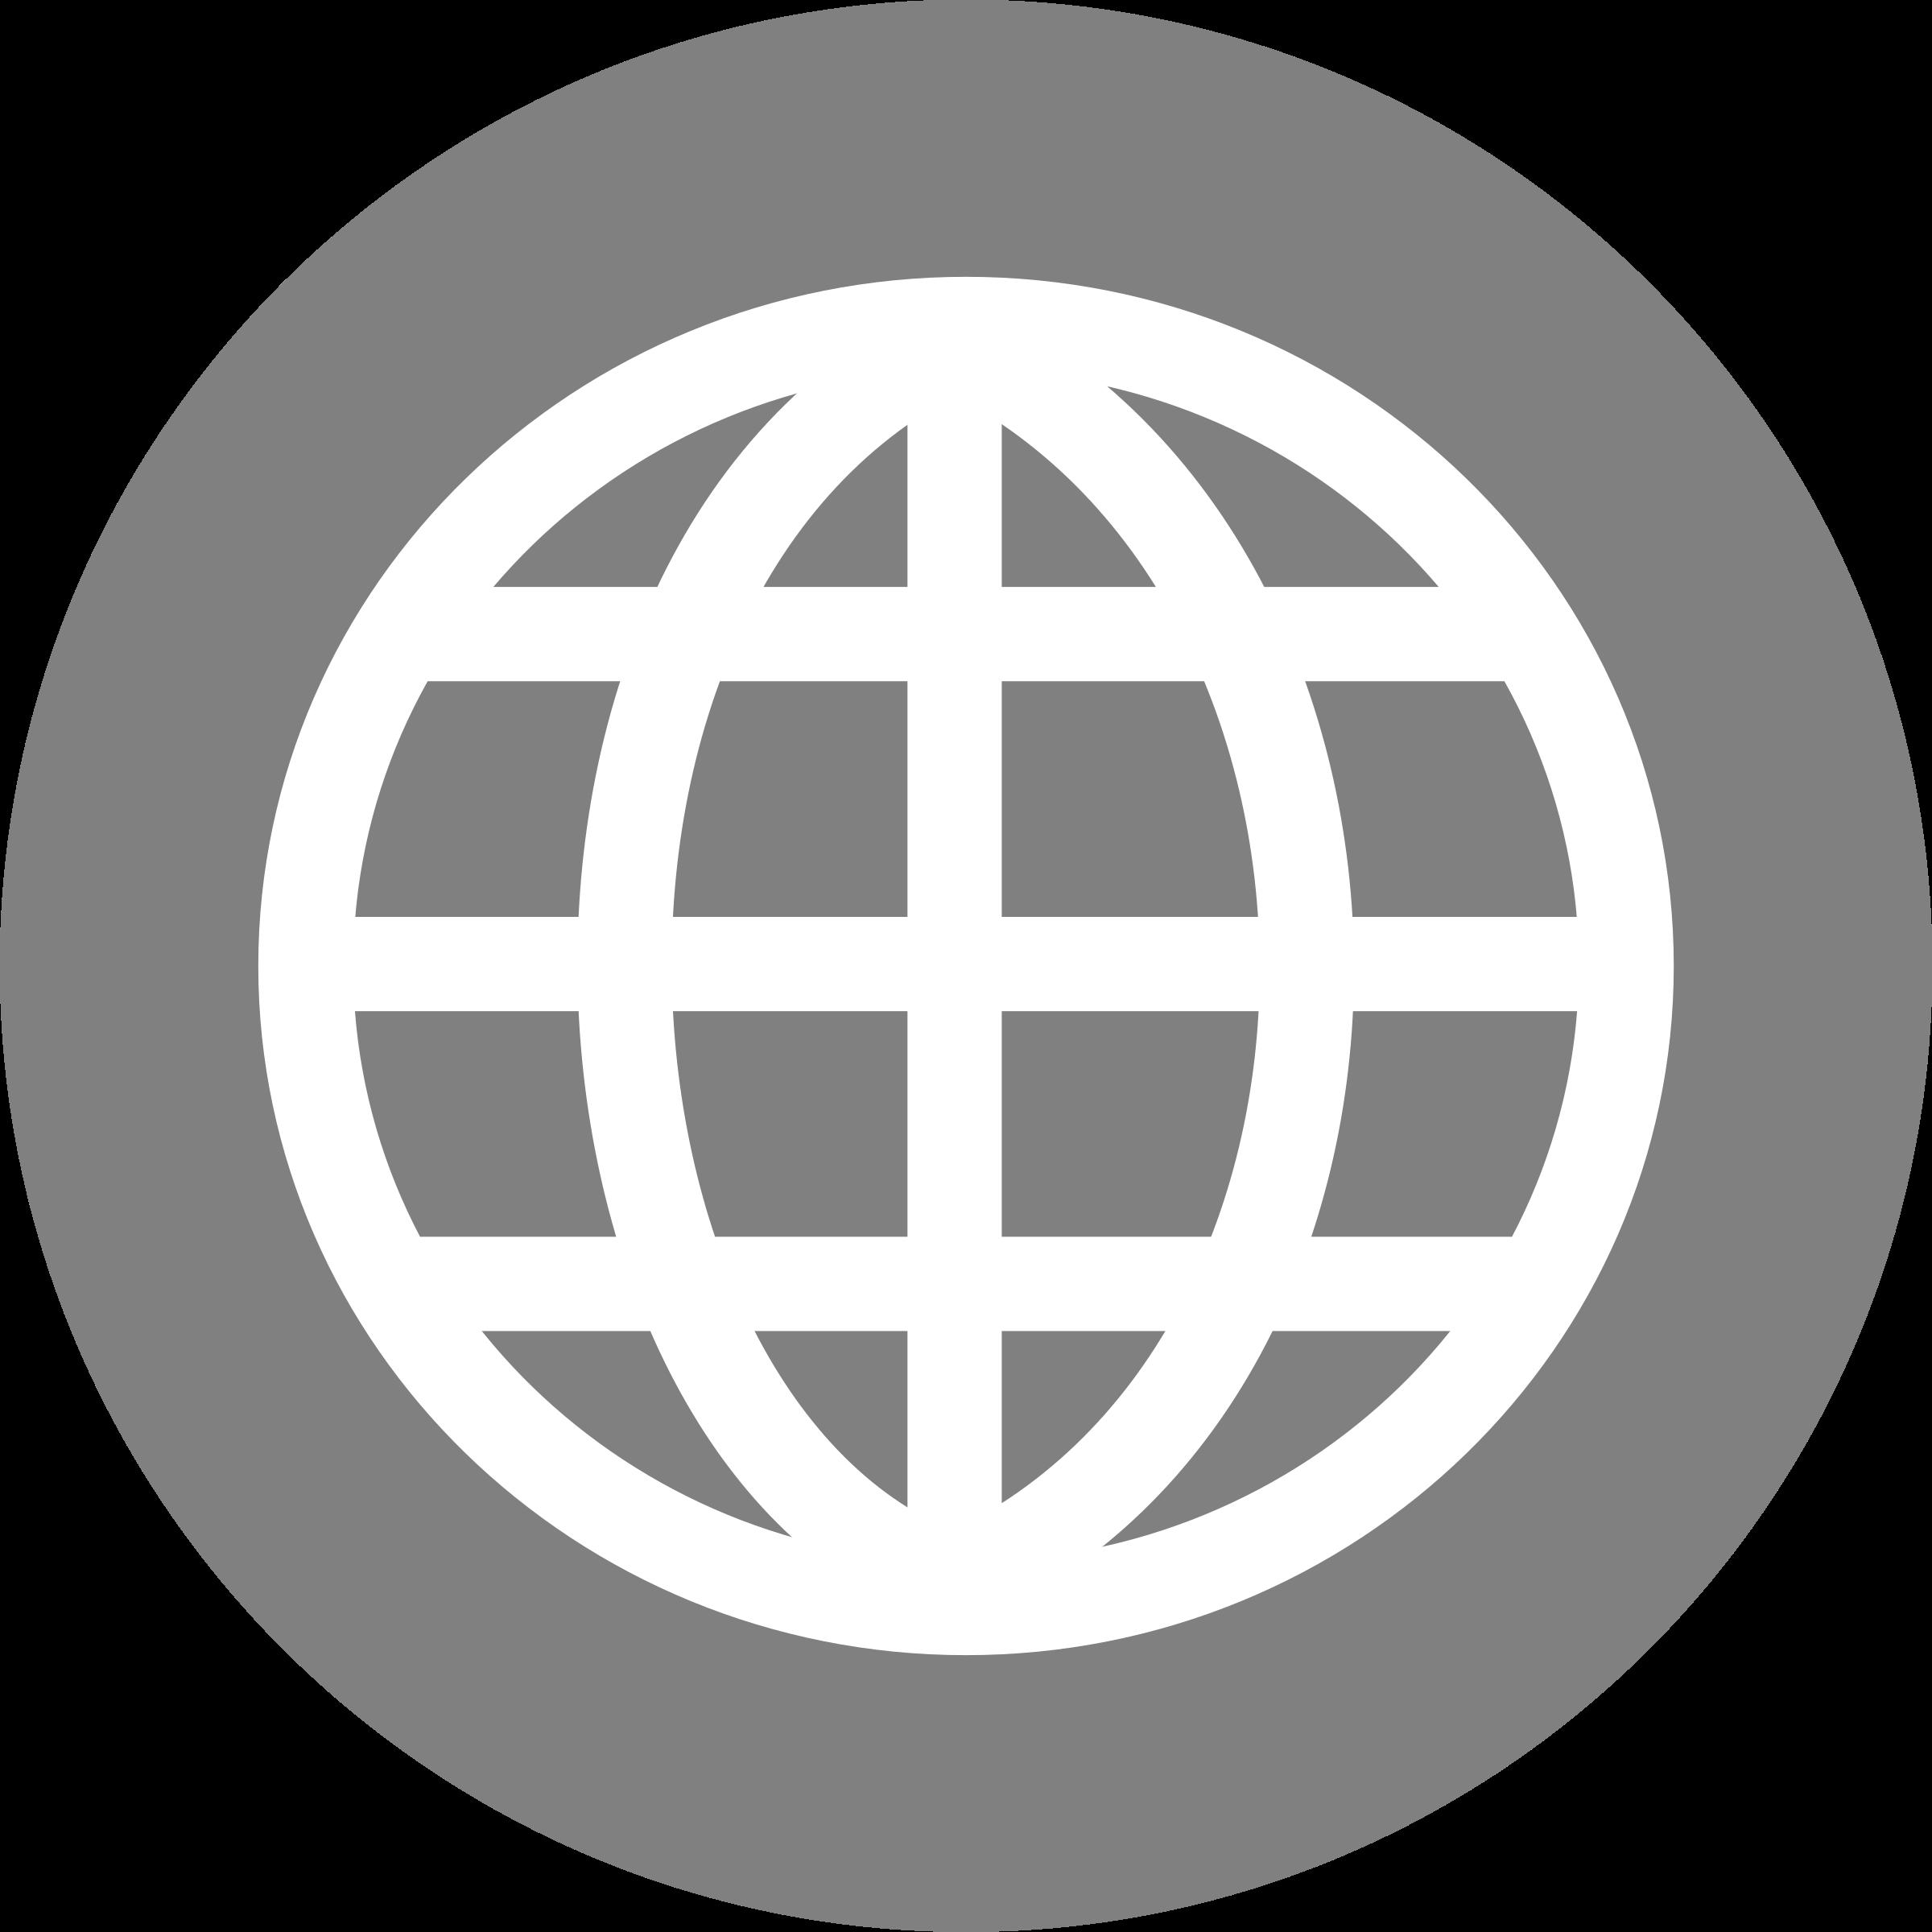 Website clipart web internet, Website web internet ...